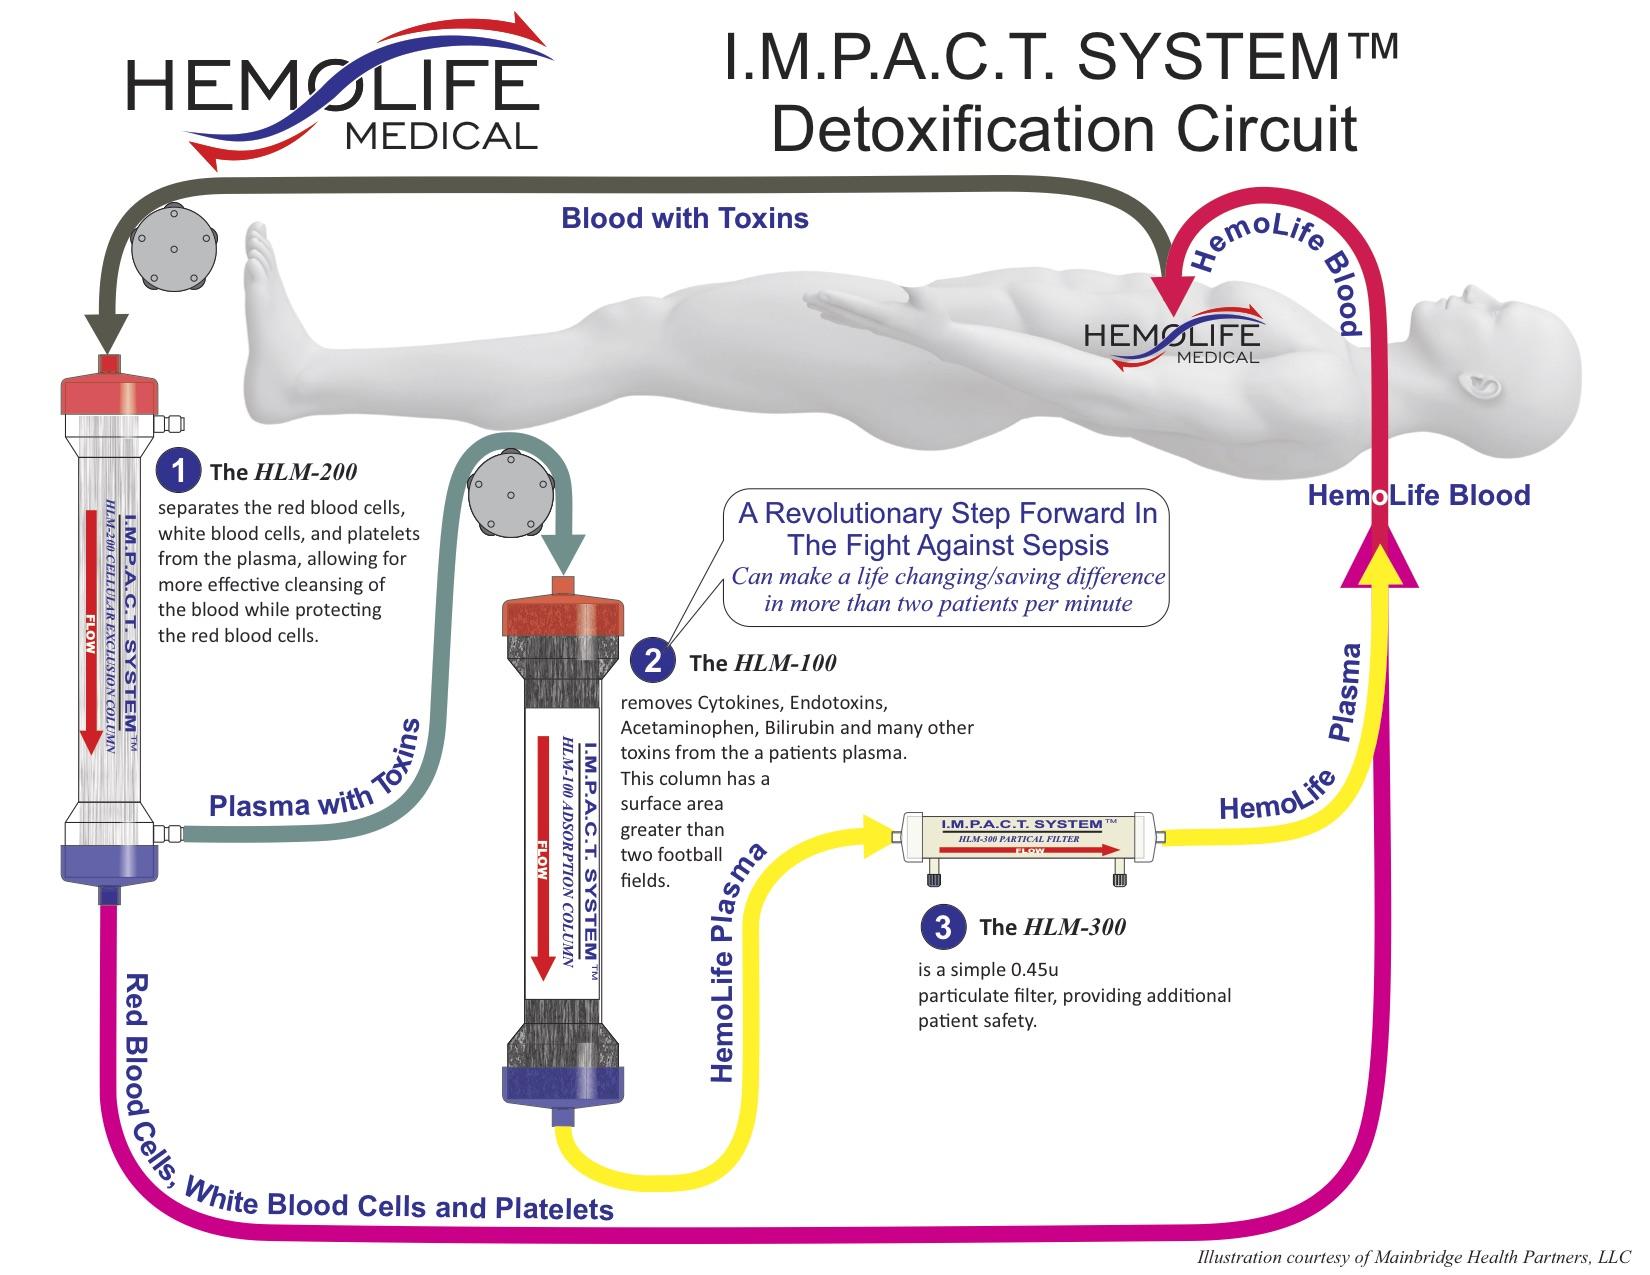 HemoLife IMPACT System